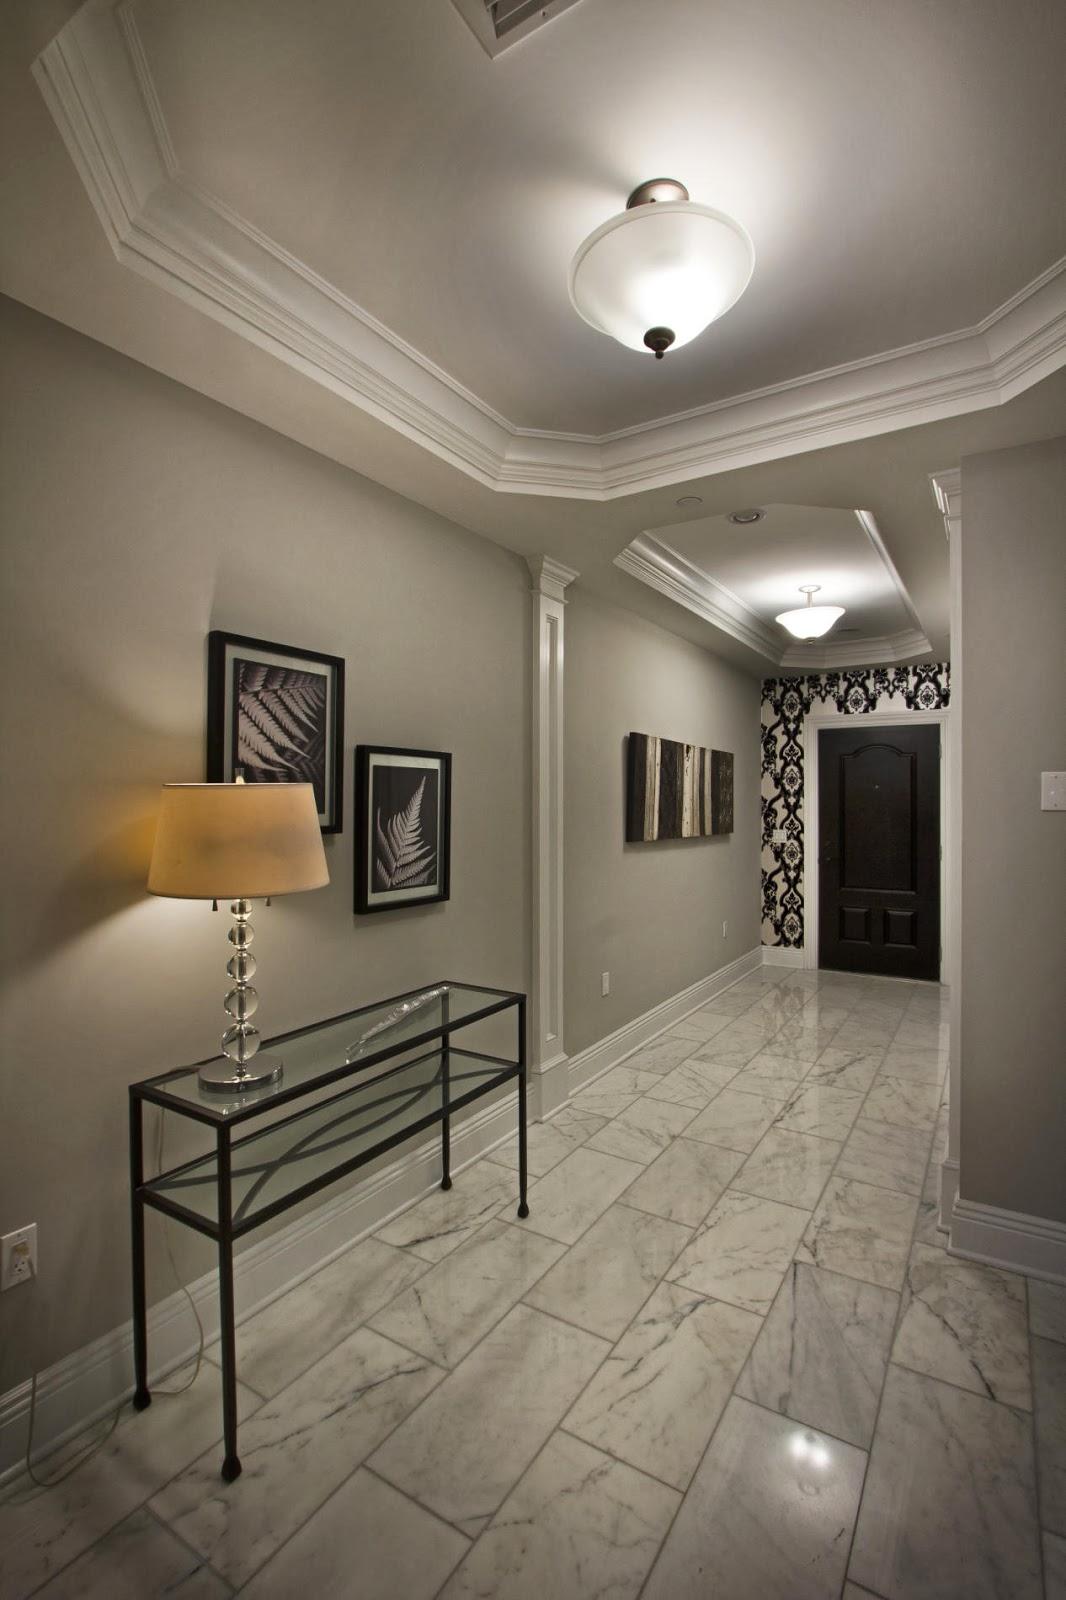 Foyer Minimalist Wallpaper : Vanessa deleon associates brings simple modern home